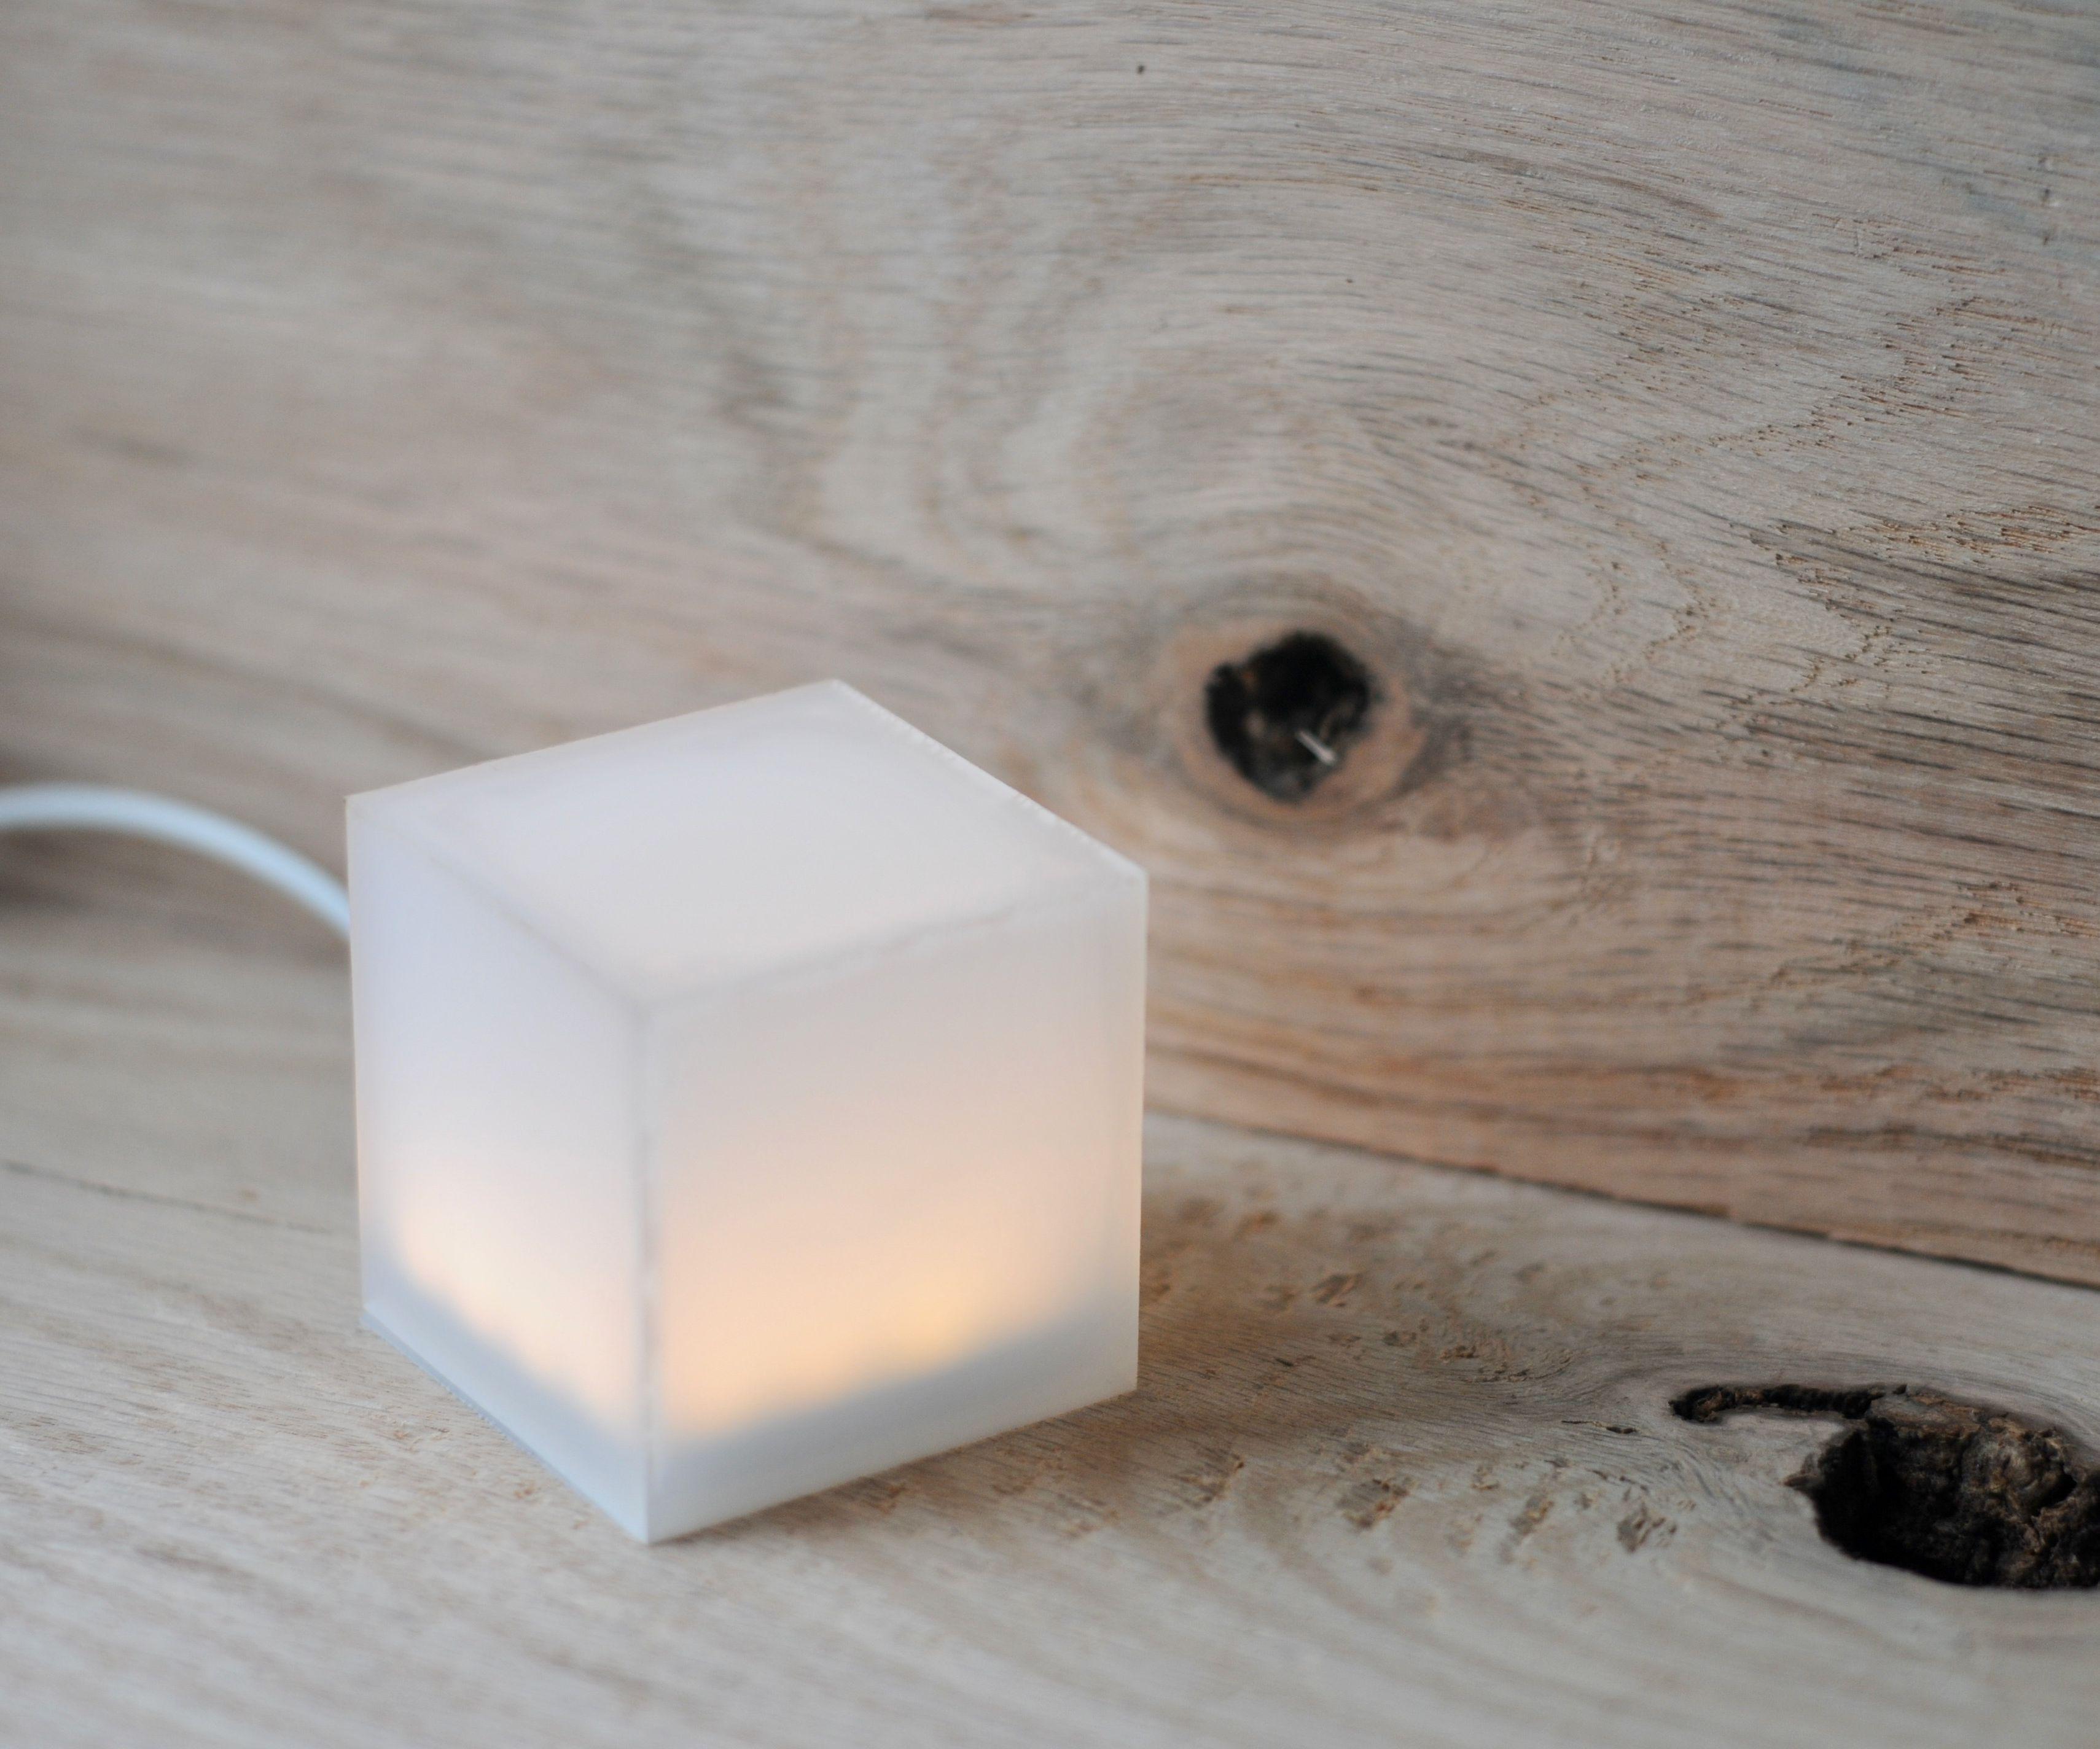 LED Cube Lamp